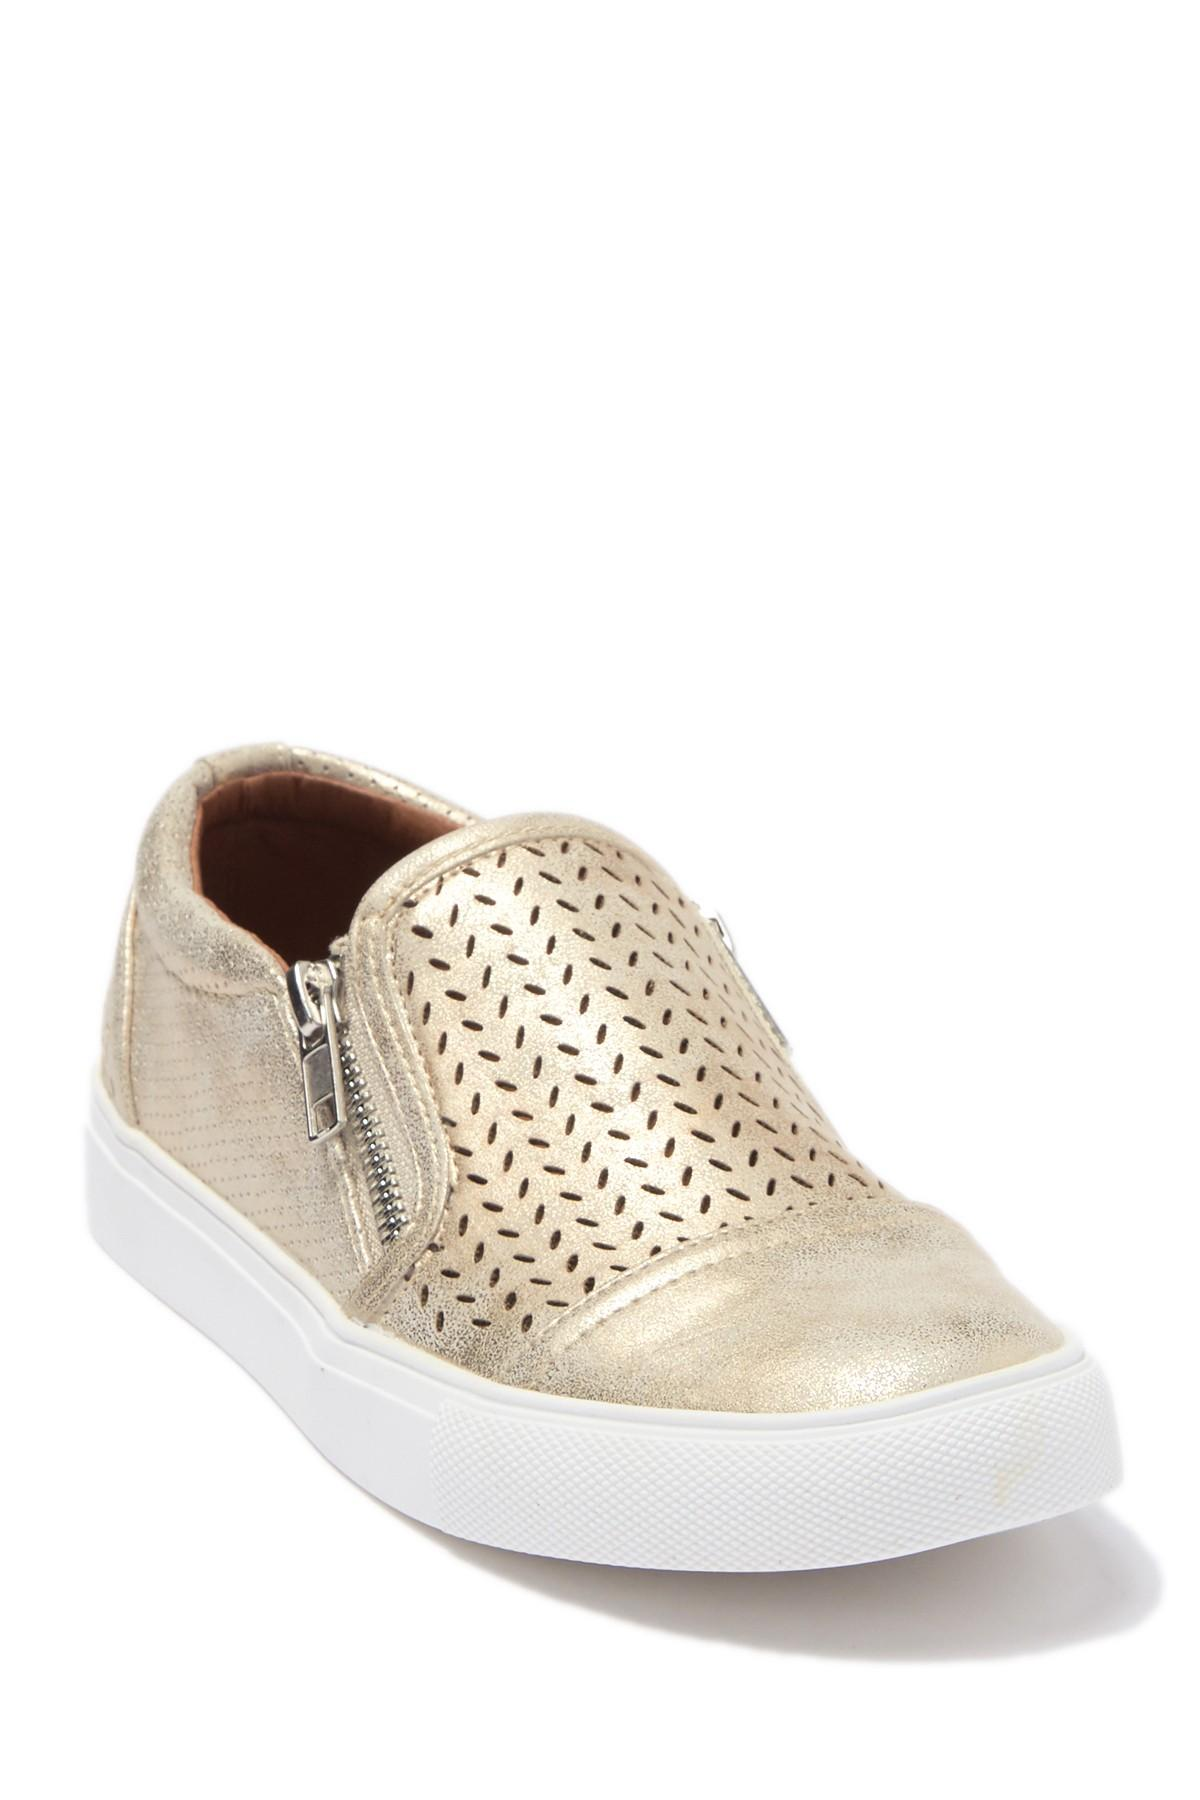 Report Alexa Perforated Zip Sneaker in